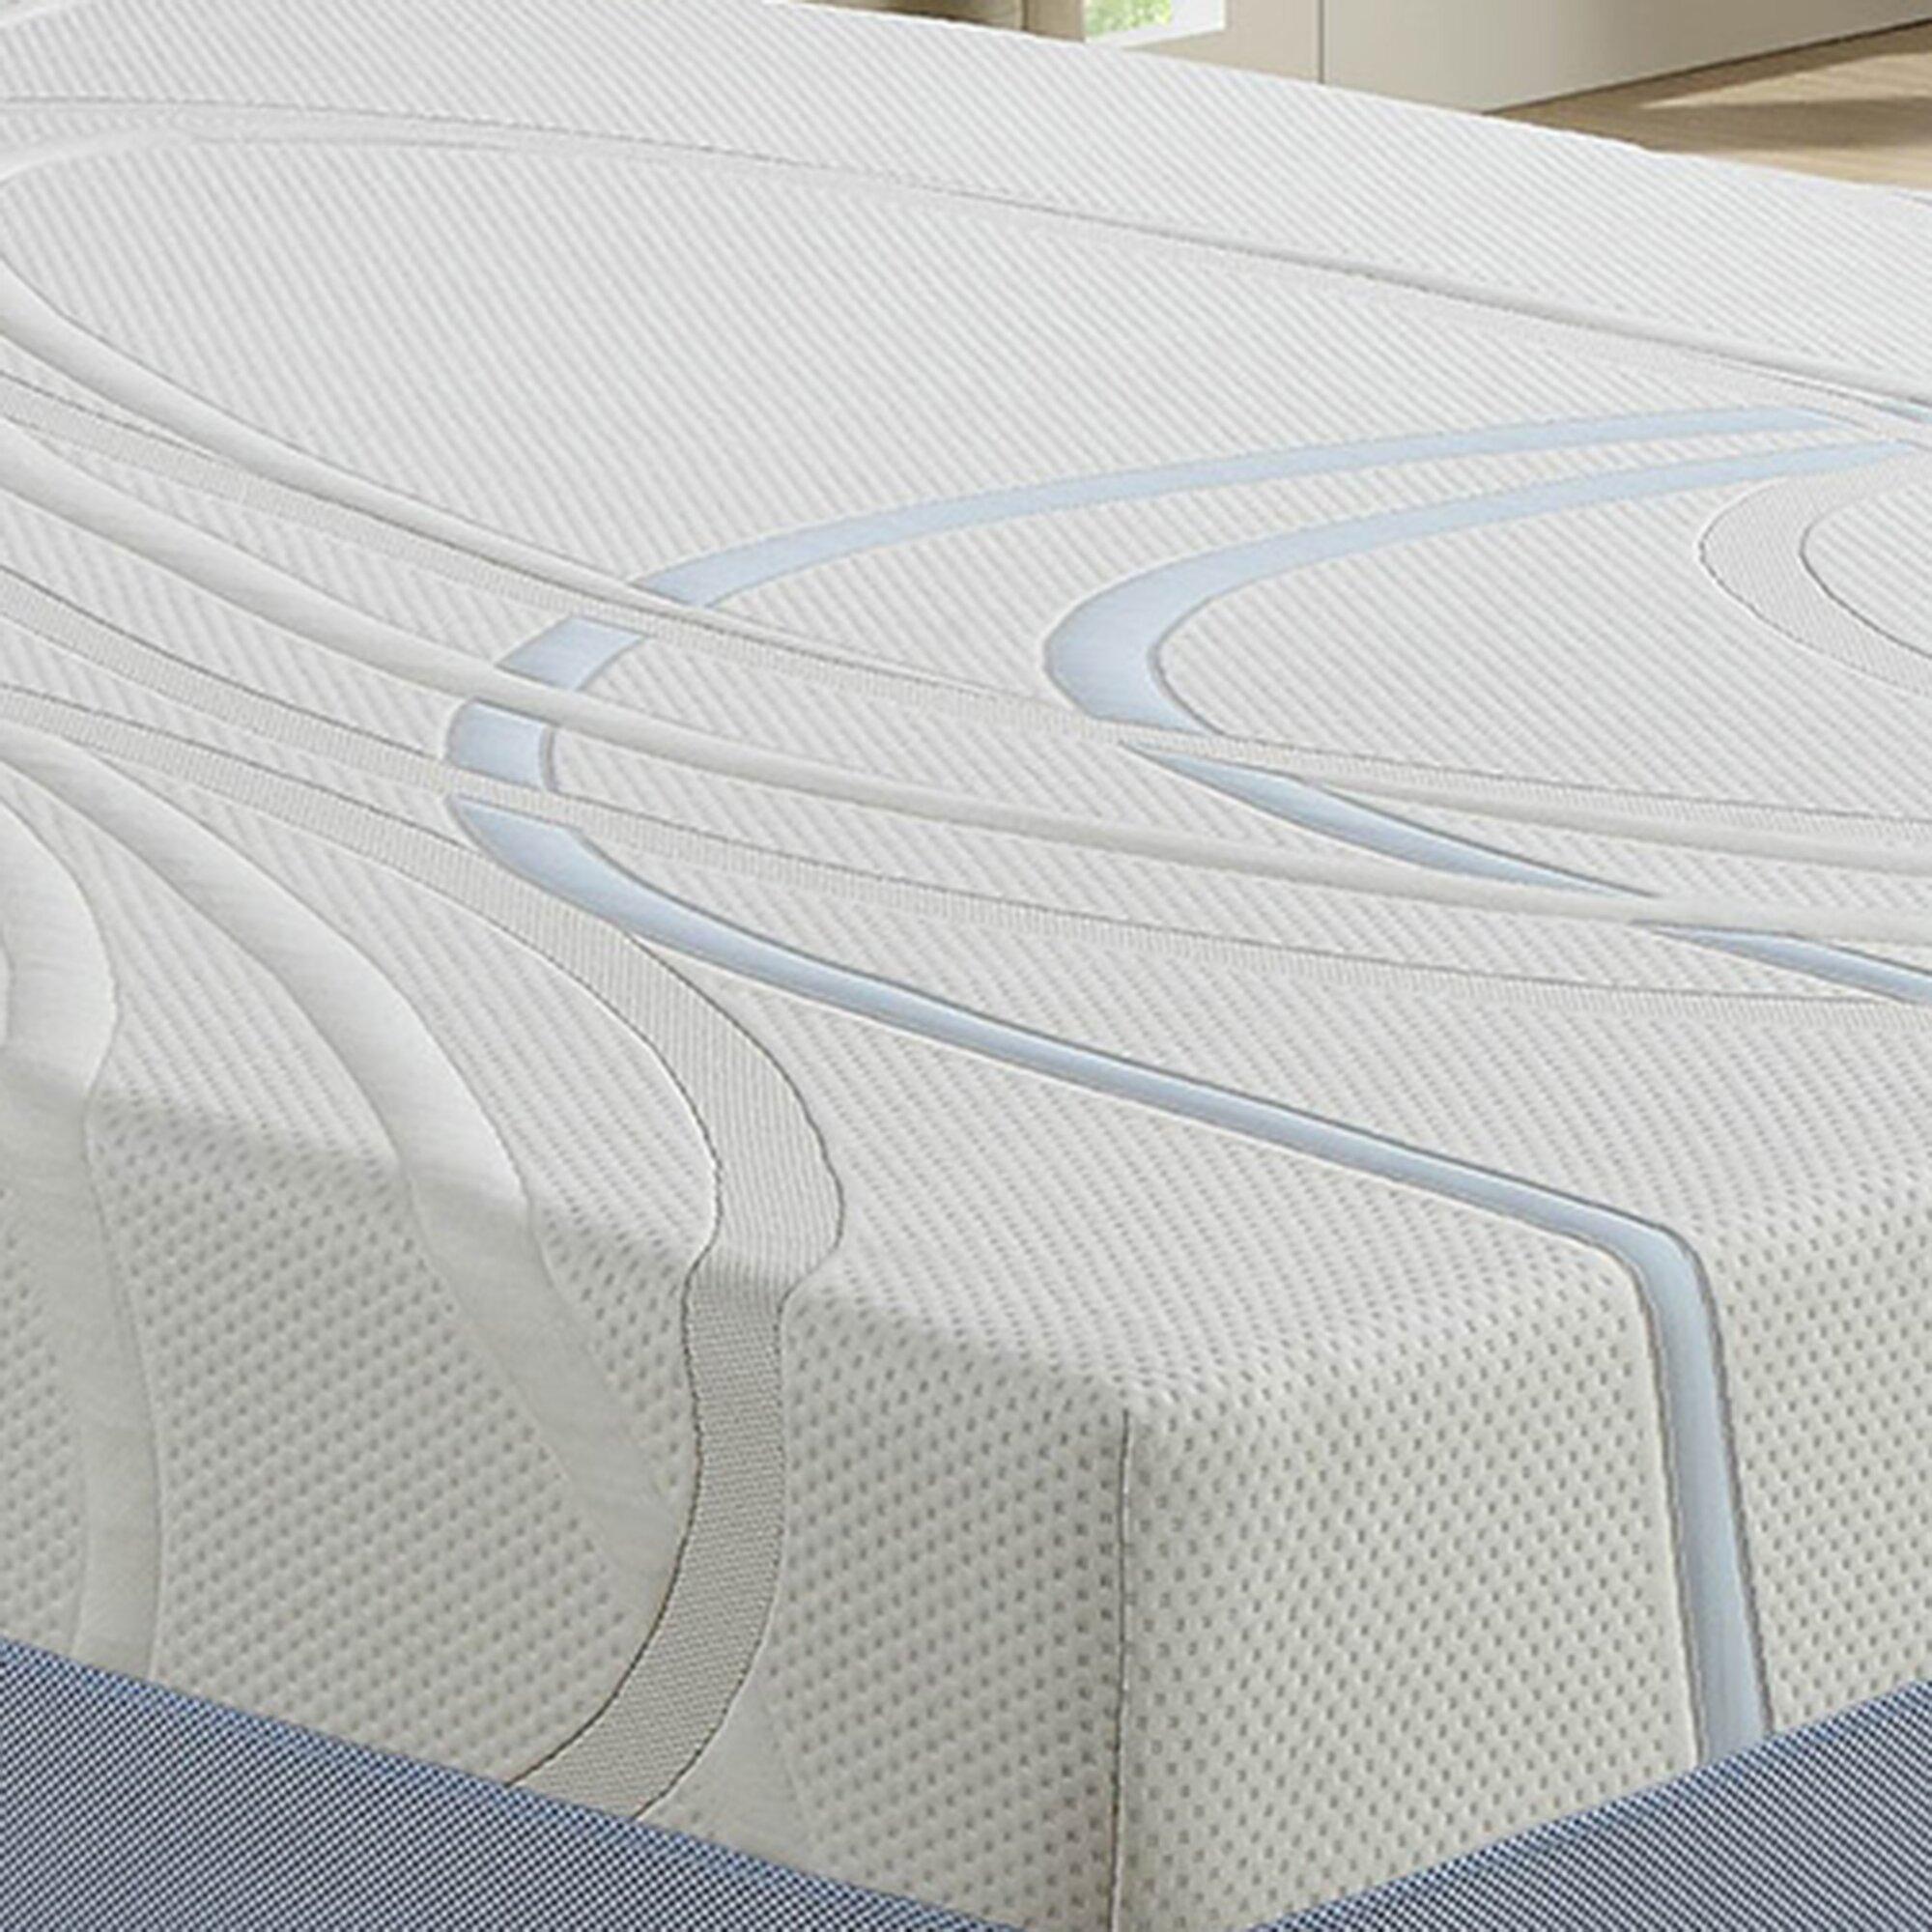 12 Firm Gel Memory Foam Mattress Reviews Birch Lane